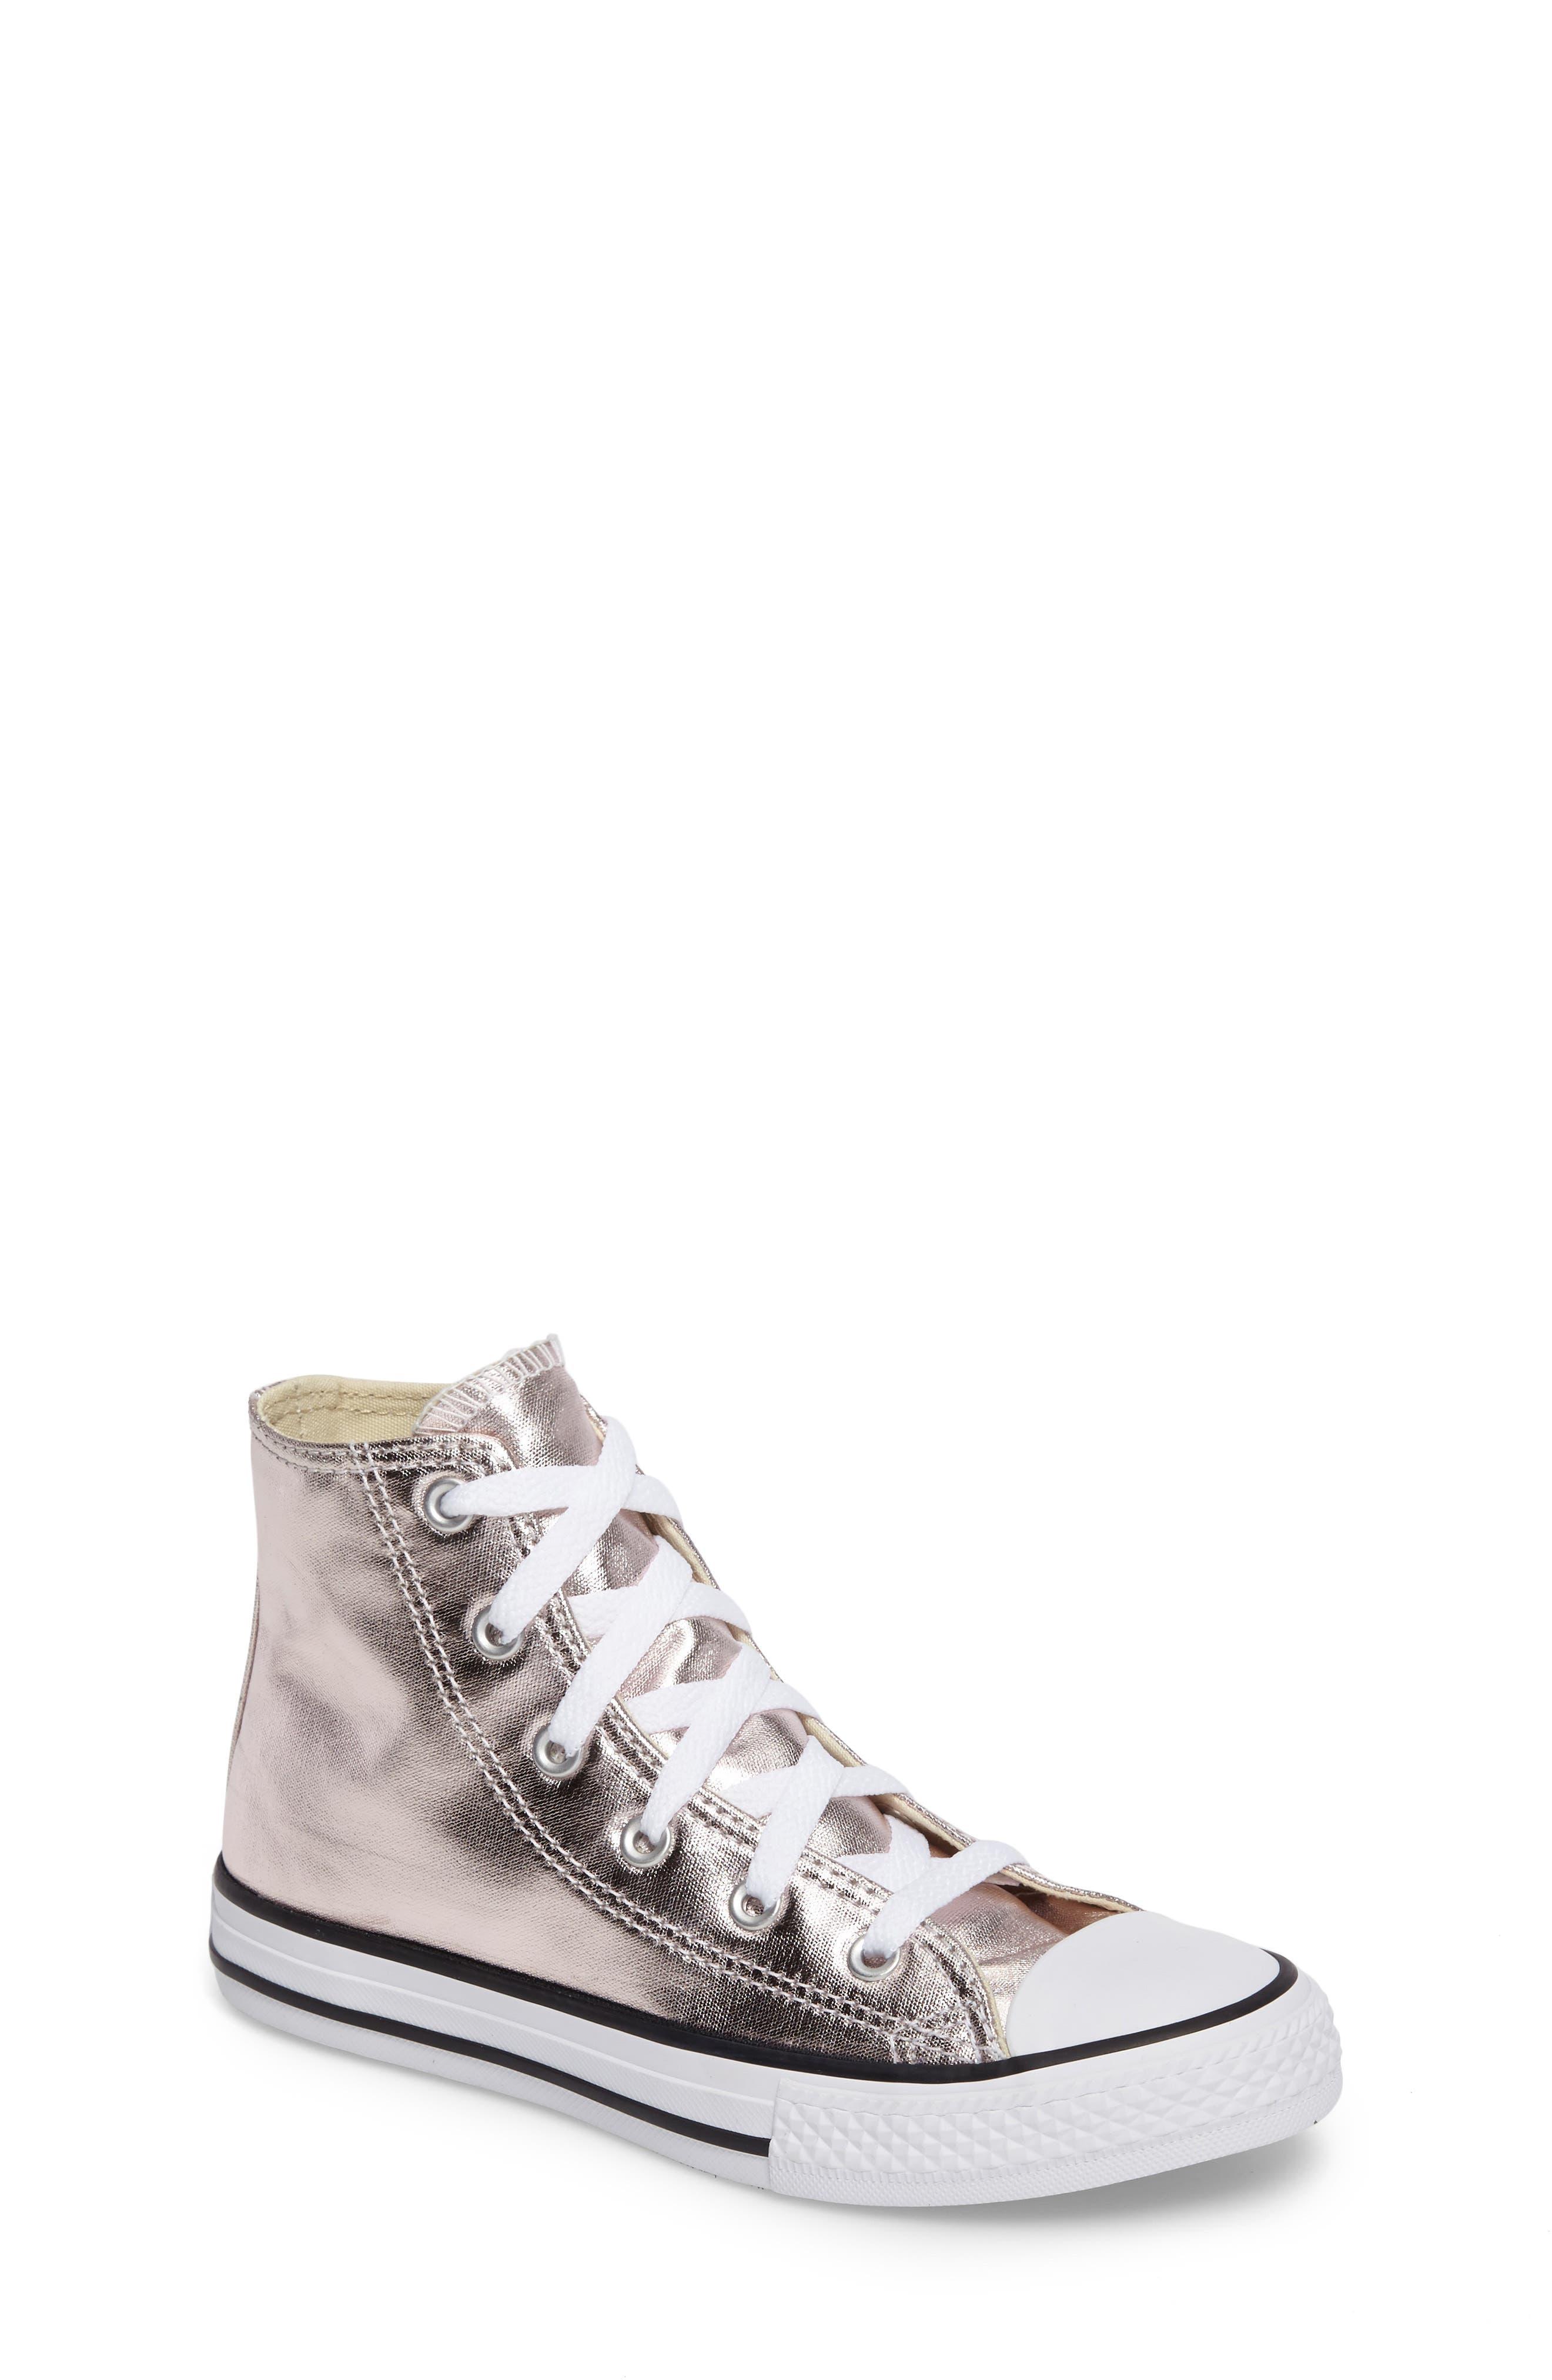 Chuck Taylor<sup>®</sup> All Star<sup>®</sup> Seasonal Metallic High Top Sneaker,                             Main thumbnail 1, color,                             Rose Quartz/ White Canvas